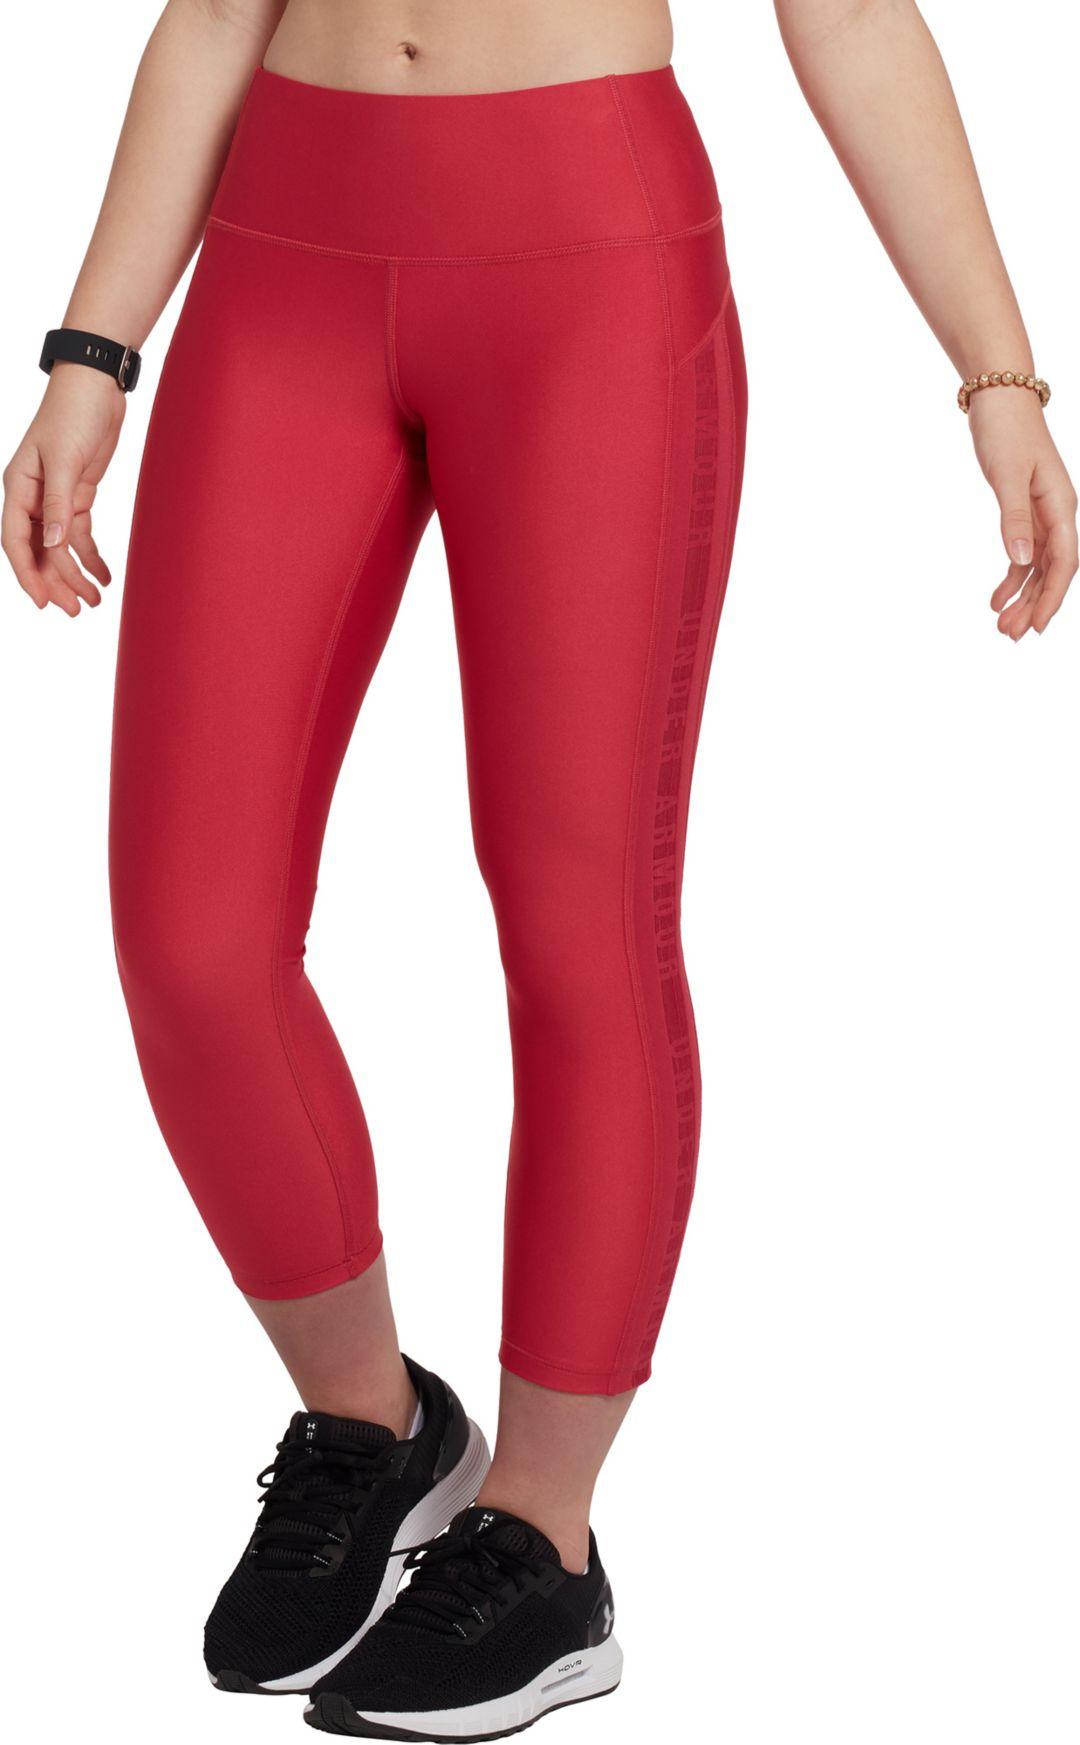 c938a448bb Under Armour Women's HeatGear Armour Ankle Crop Brand Leggings